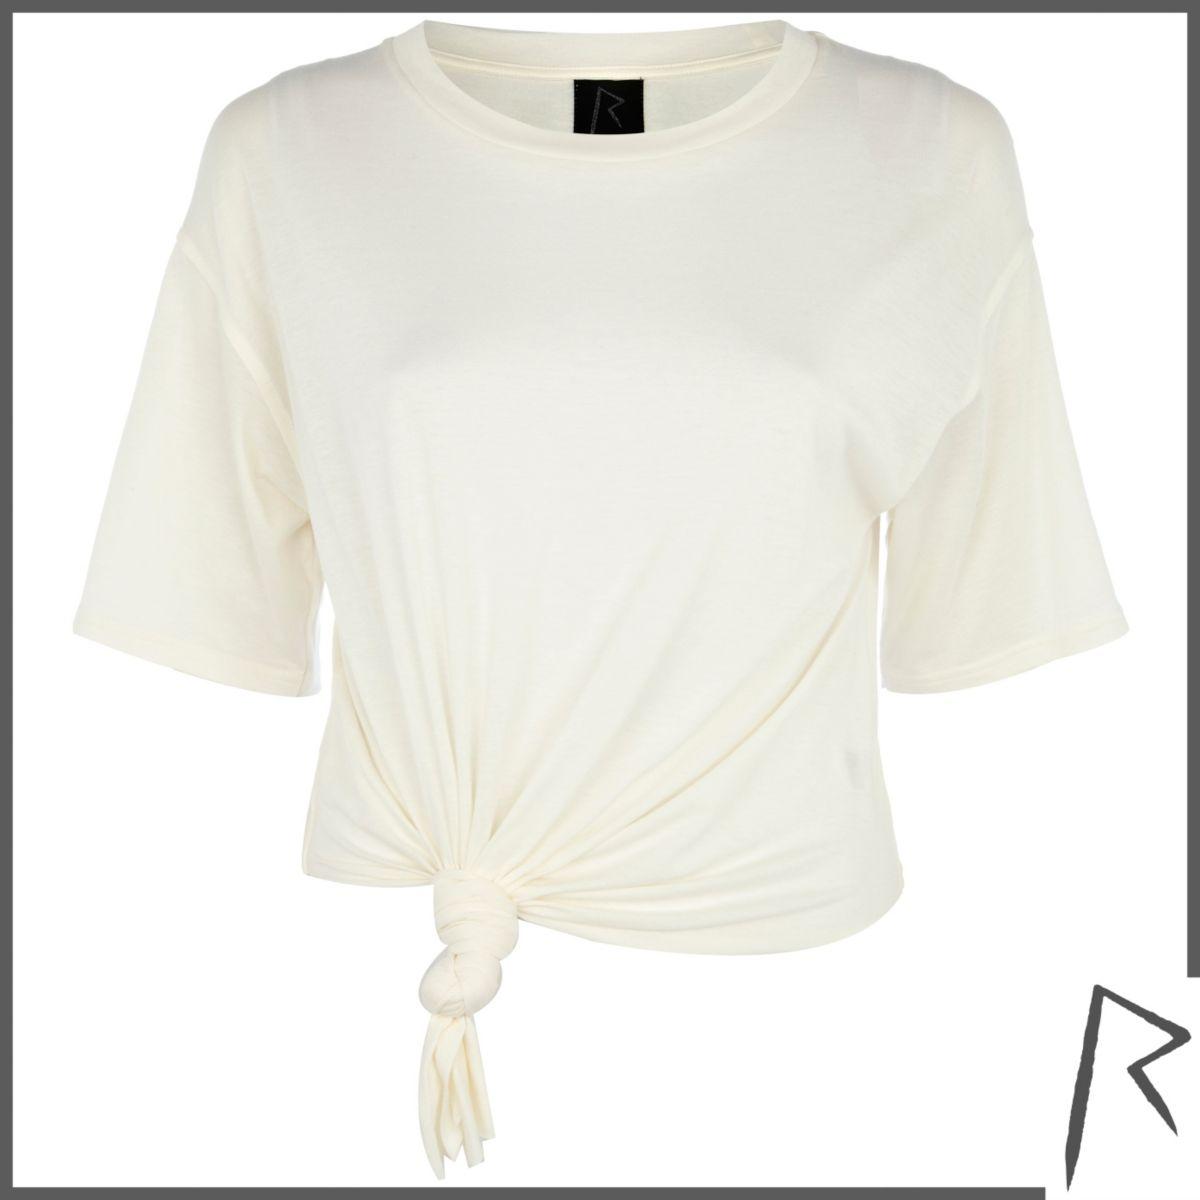 Cream Rihanna knot front cropped t-shirt